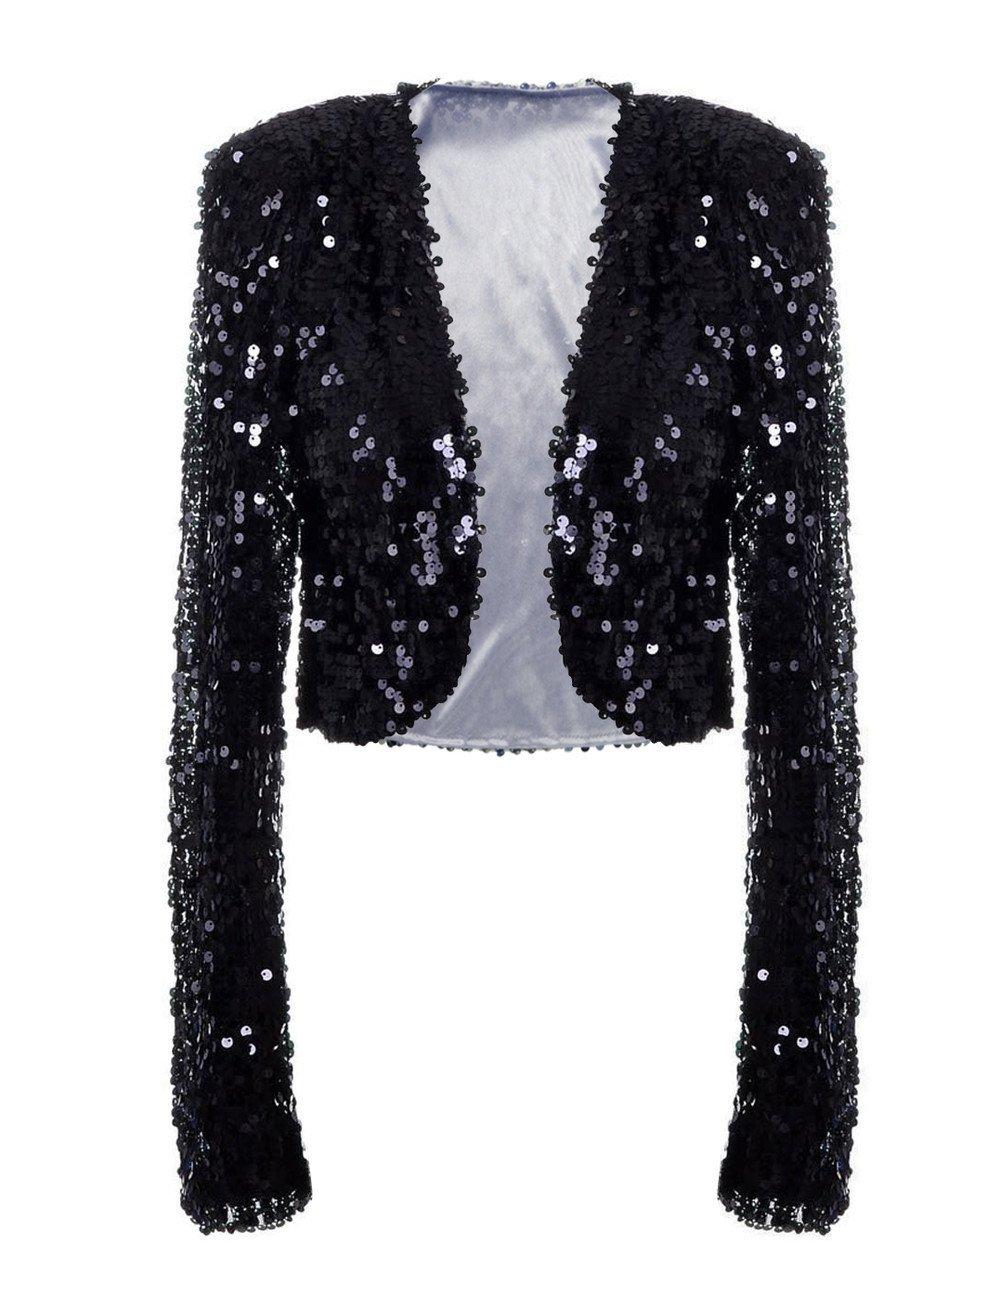 PrettyGuide Women Sequin Cropped Jacket Long Sleeve Sparkly Bolero DS Clubwear Black M/US6-8